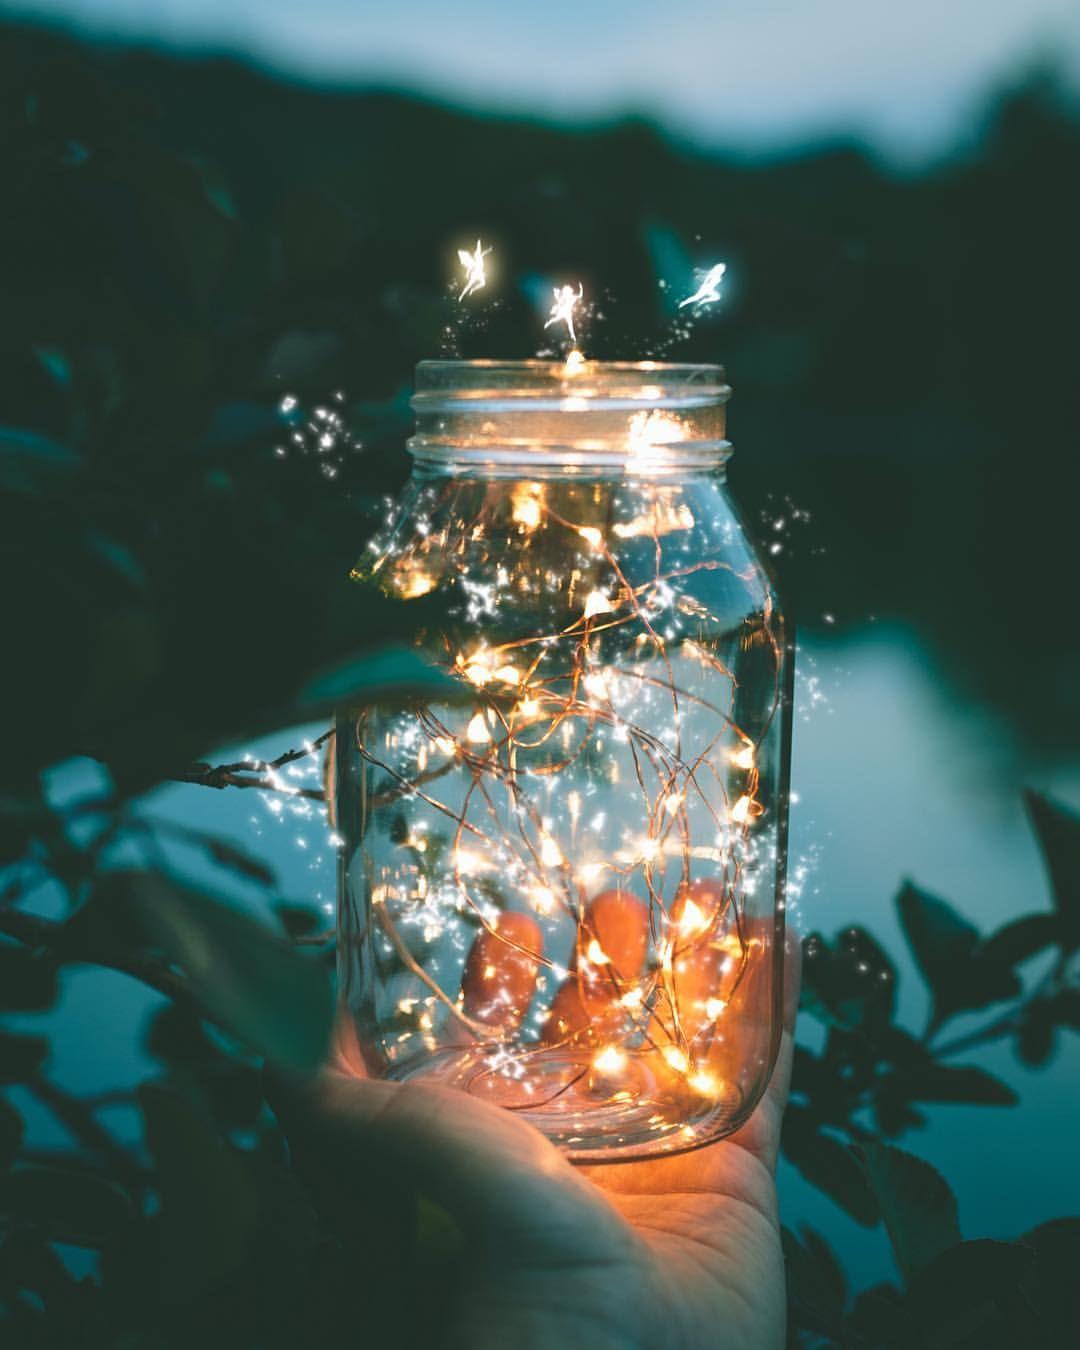 108 Likes 6 Comments Silviu Z Silviuz On Instagram They Escaped Tonetality Mason Jar Fairy Lights Fairy Light Photography Lit Wallpaper